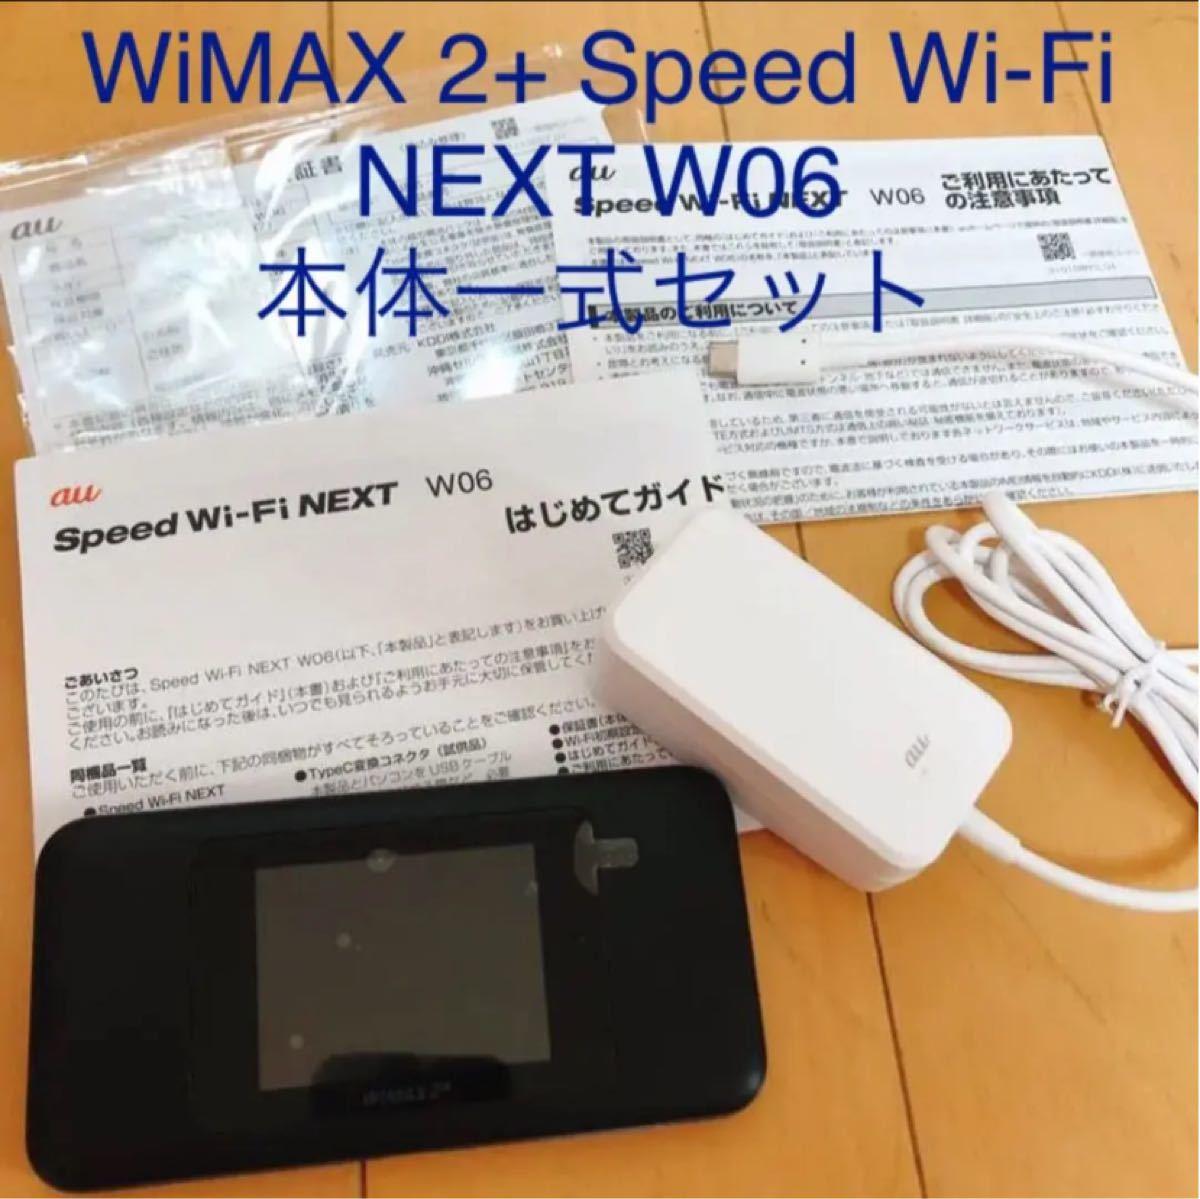 WiMAX 2+ Speed Wi-Fi NEXT W06 本体一式セット